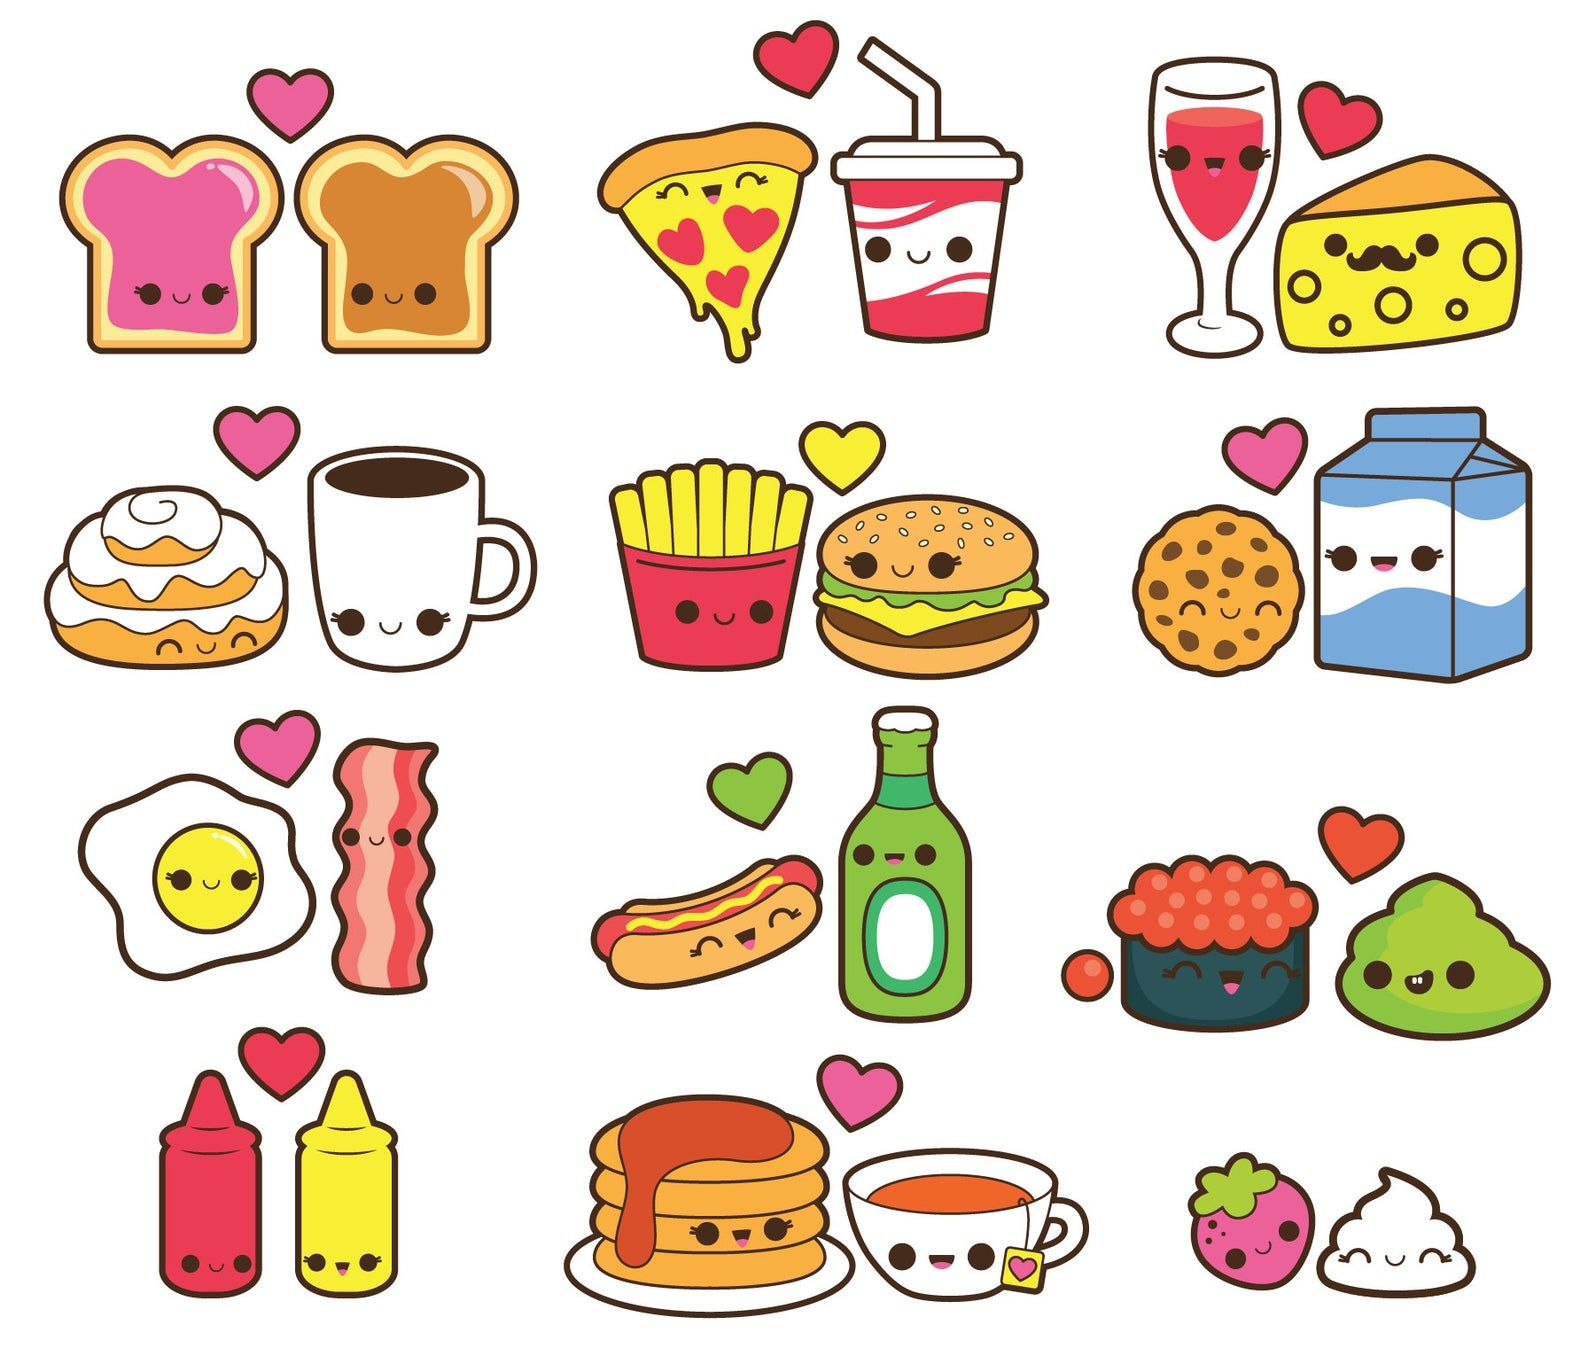 Valentine Clipart Kawaii Food Clipart Kawaii Valentines Day Etsy In 2020 Kawaii Valentine Kawaii Drawings Cute Food Drawings